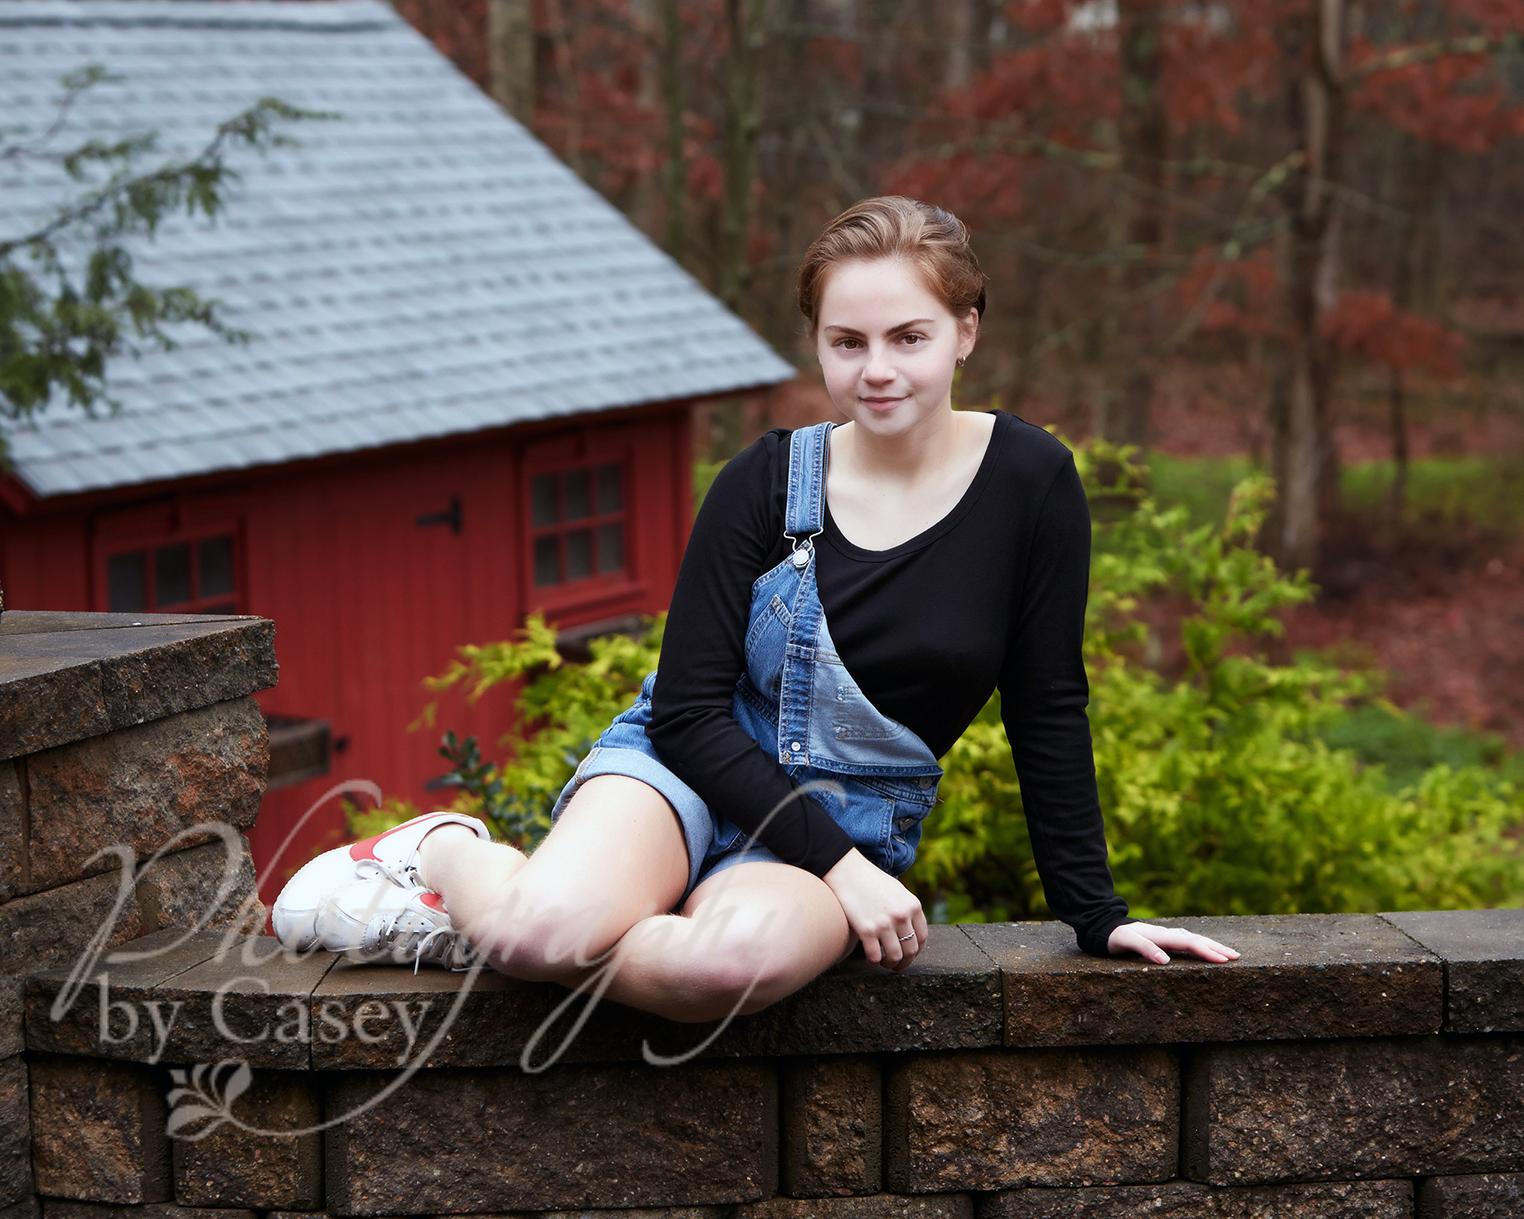 High School Senior Portraits | Attleboro MA | Photography by Casey